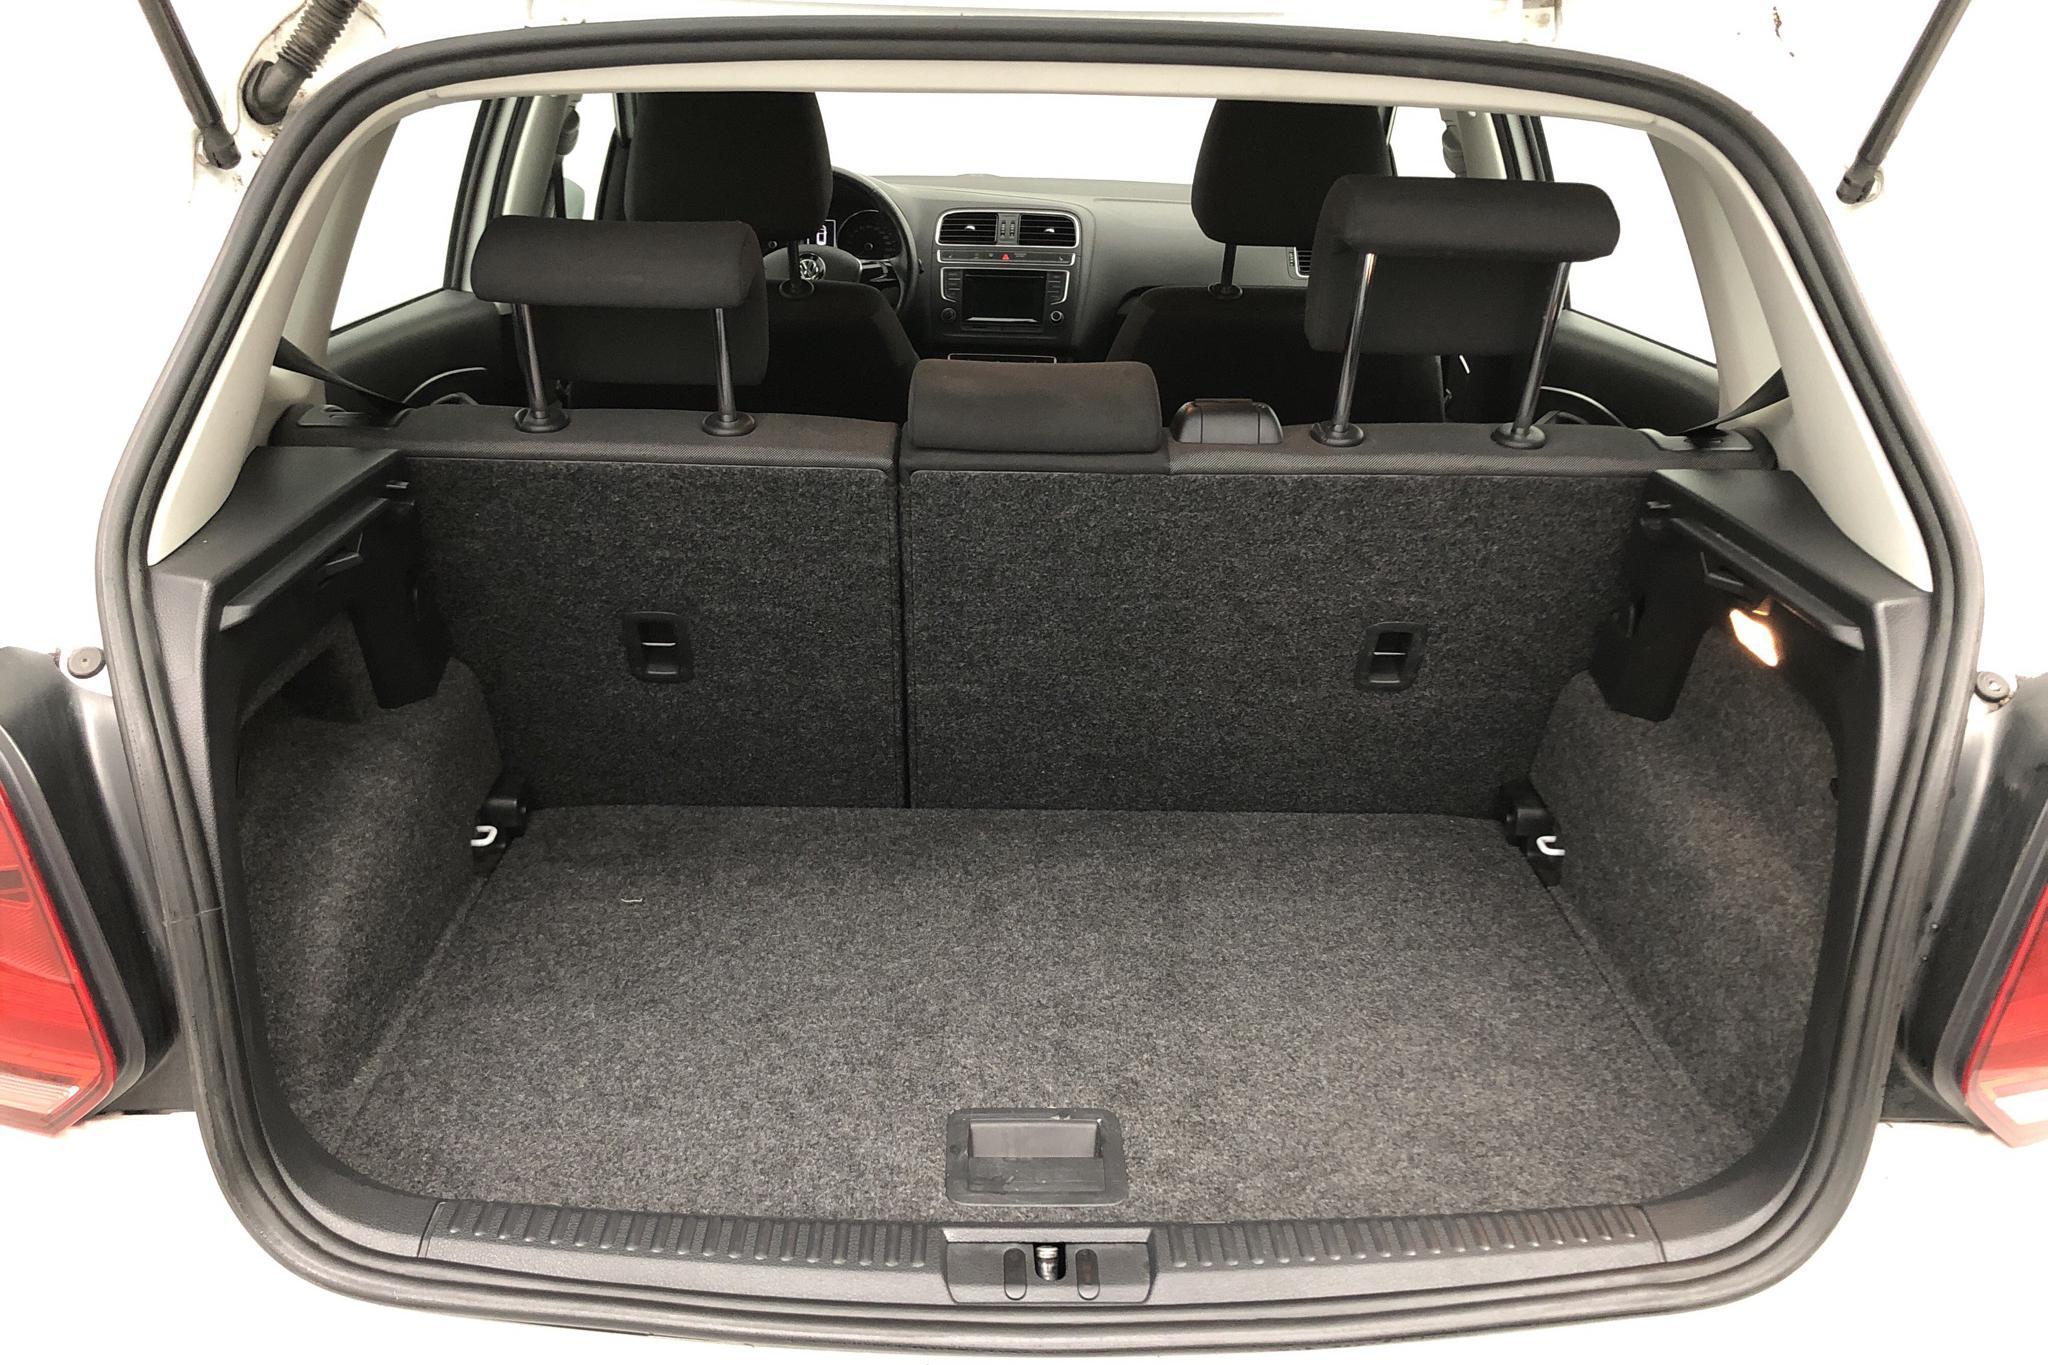 VW Polo 1.2 TSI 5dr (90hk) - 11 539 mil - Manuell - vit - 2015